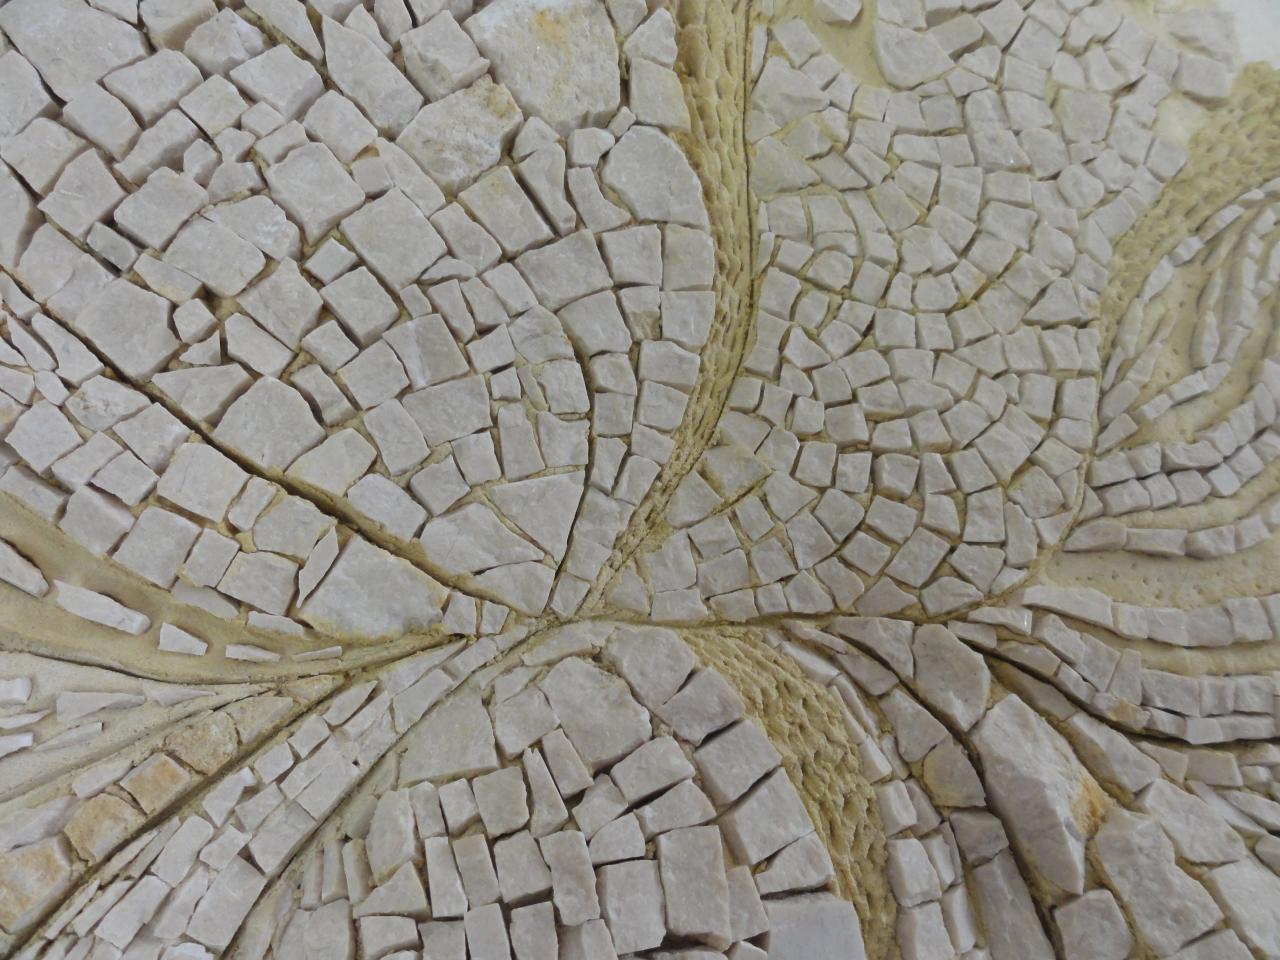 Terre inconnue (détail) - Olga Choquel